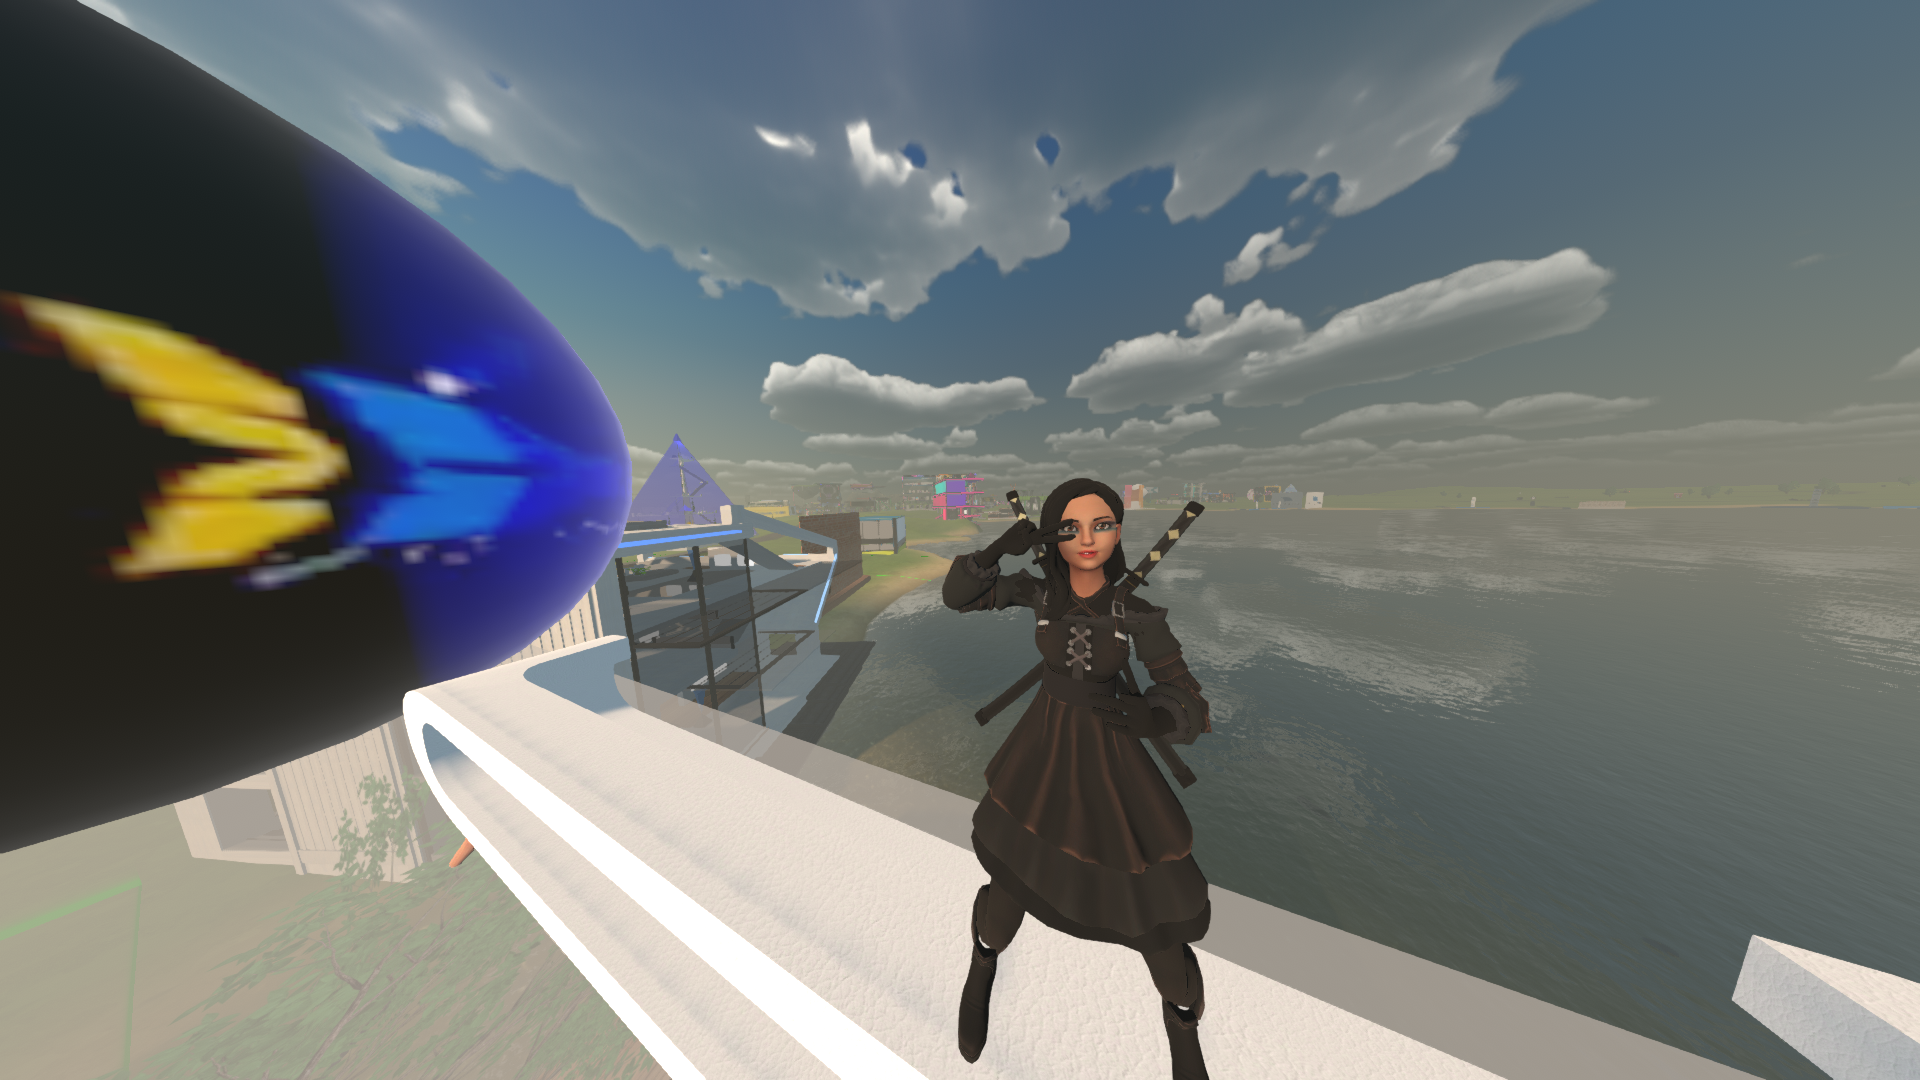 Create A Selfie-Based Avatar for Somnium Space